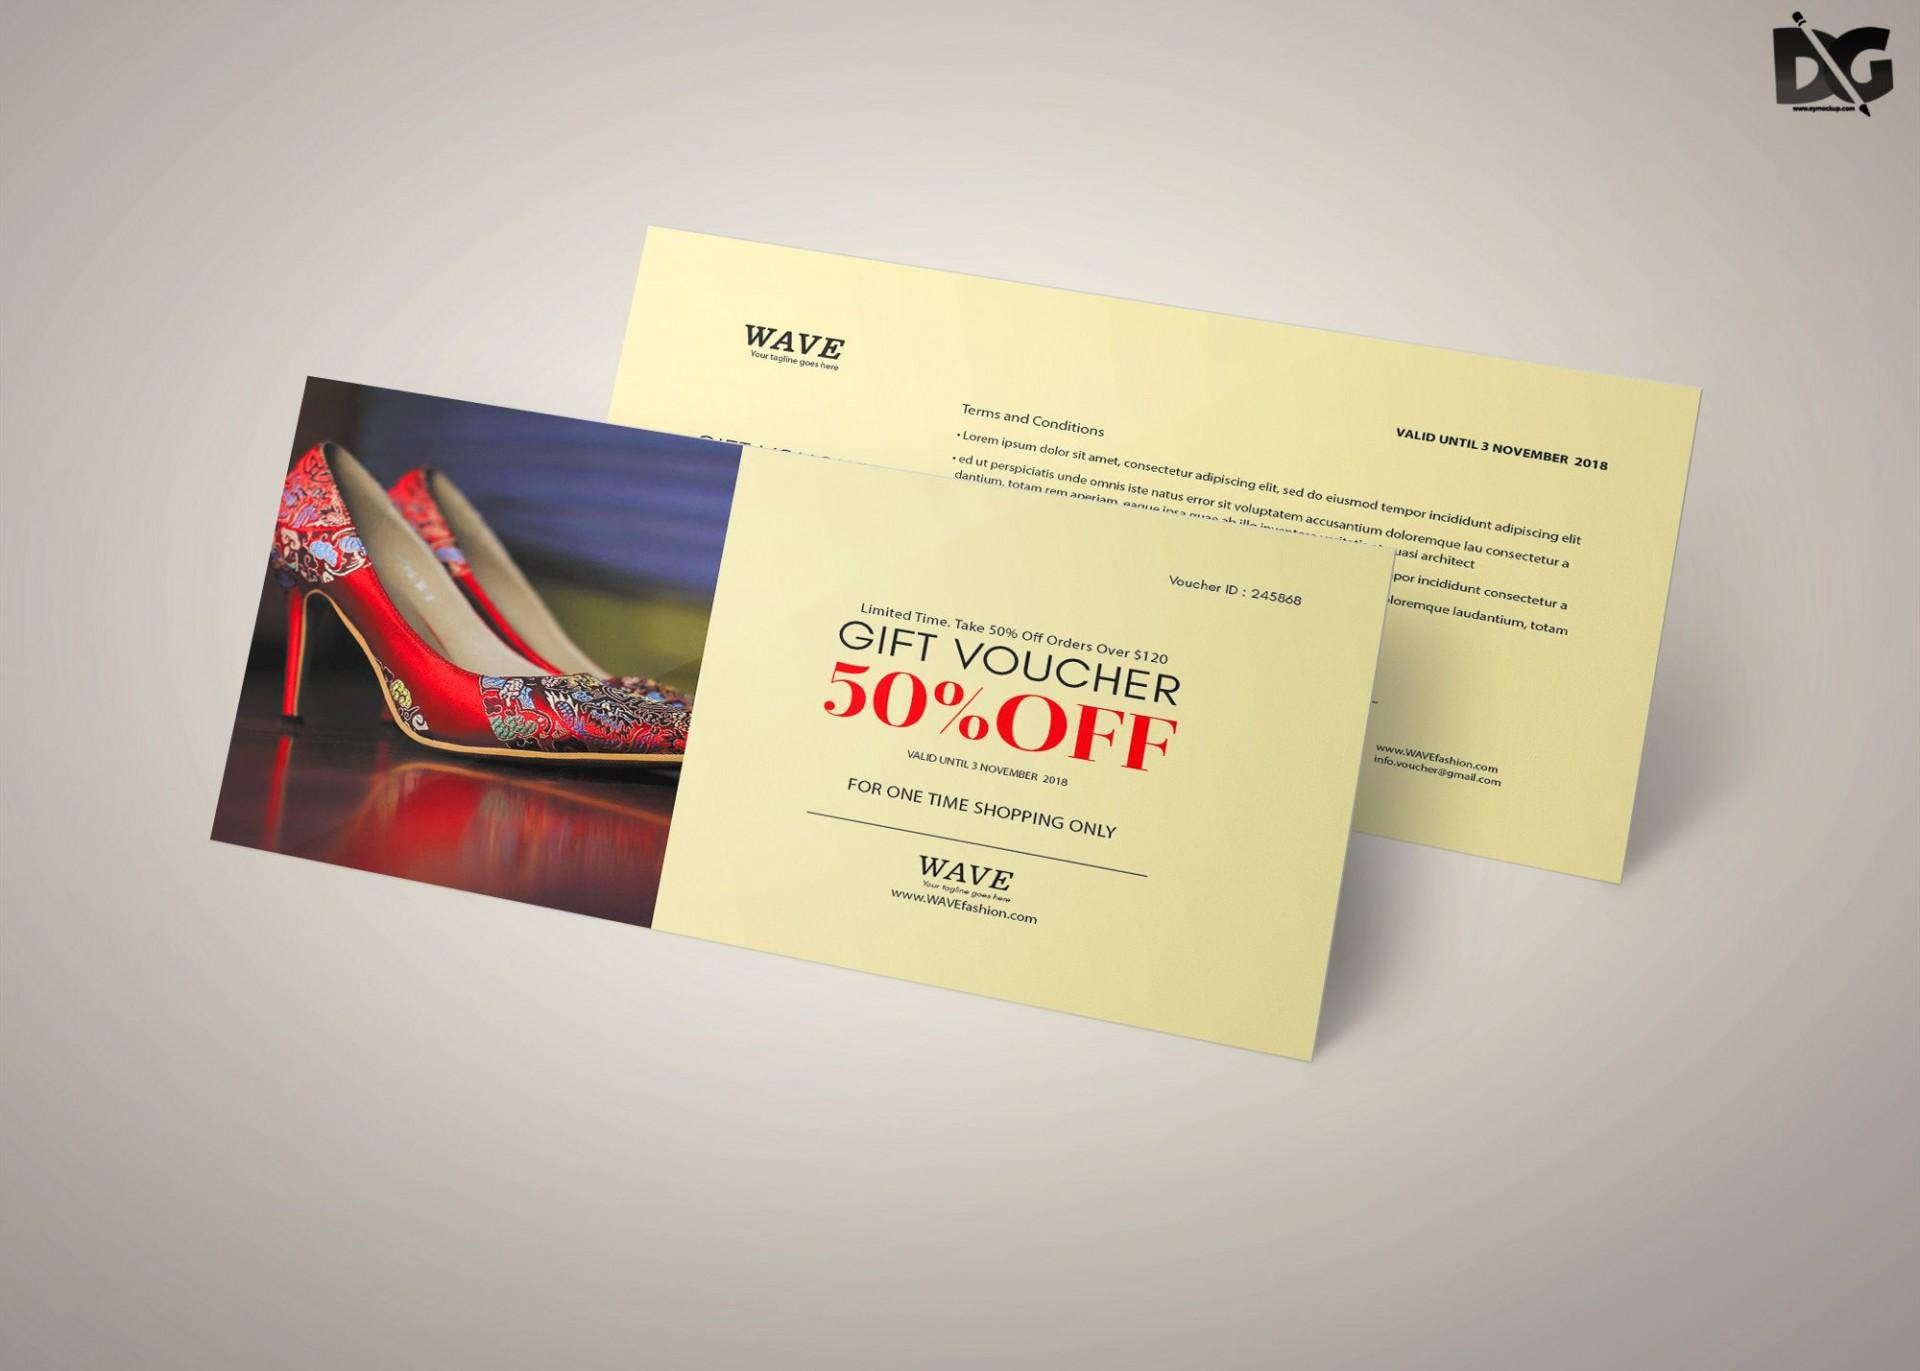 008 Breathtaking Gift Card Template Psd Design  Christma Photoshop Free Holder1920